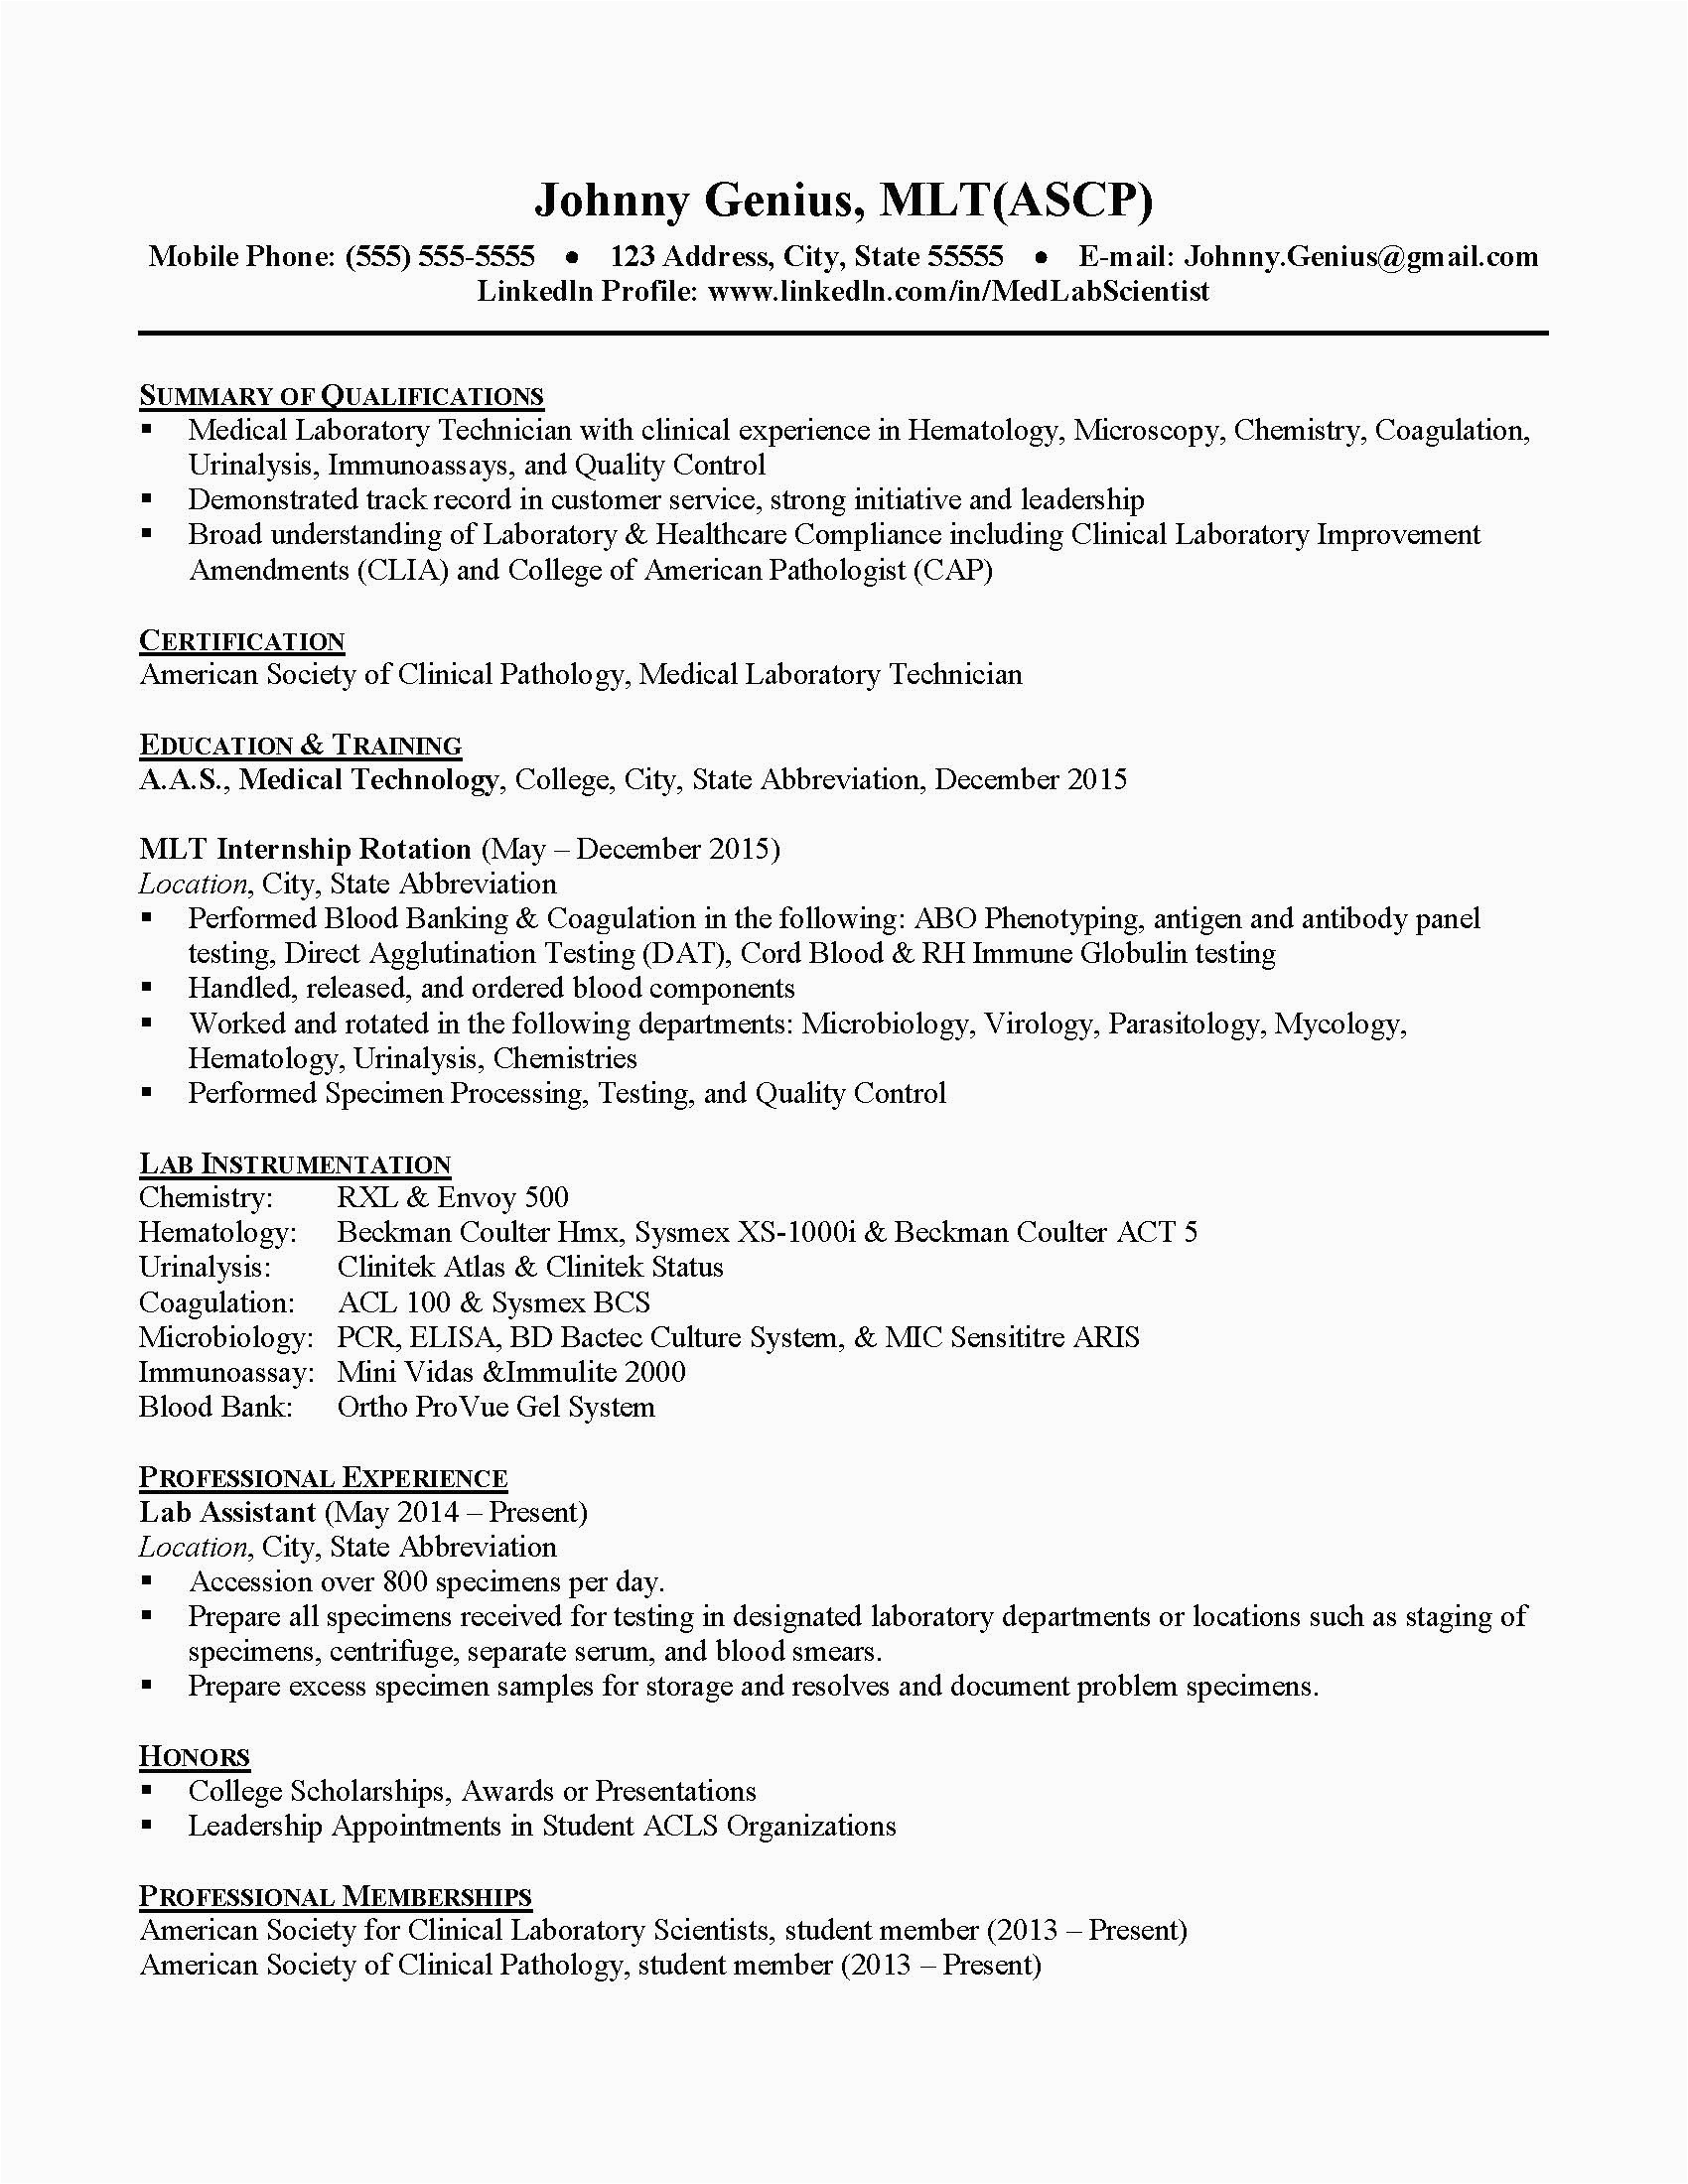 medical technology sample resume for medical technologist fresh graduate